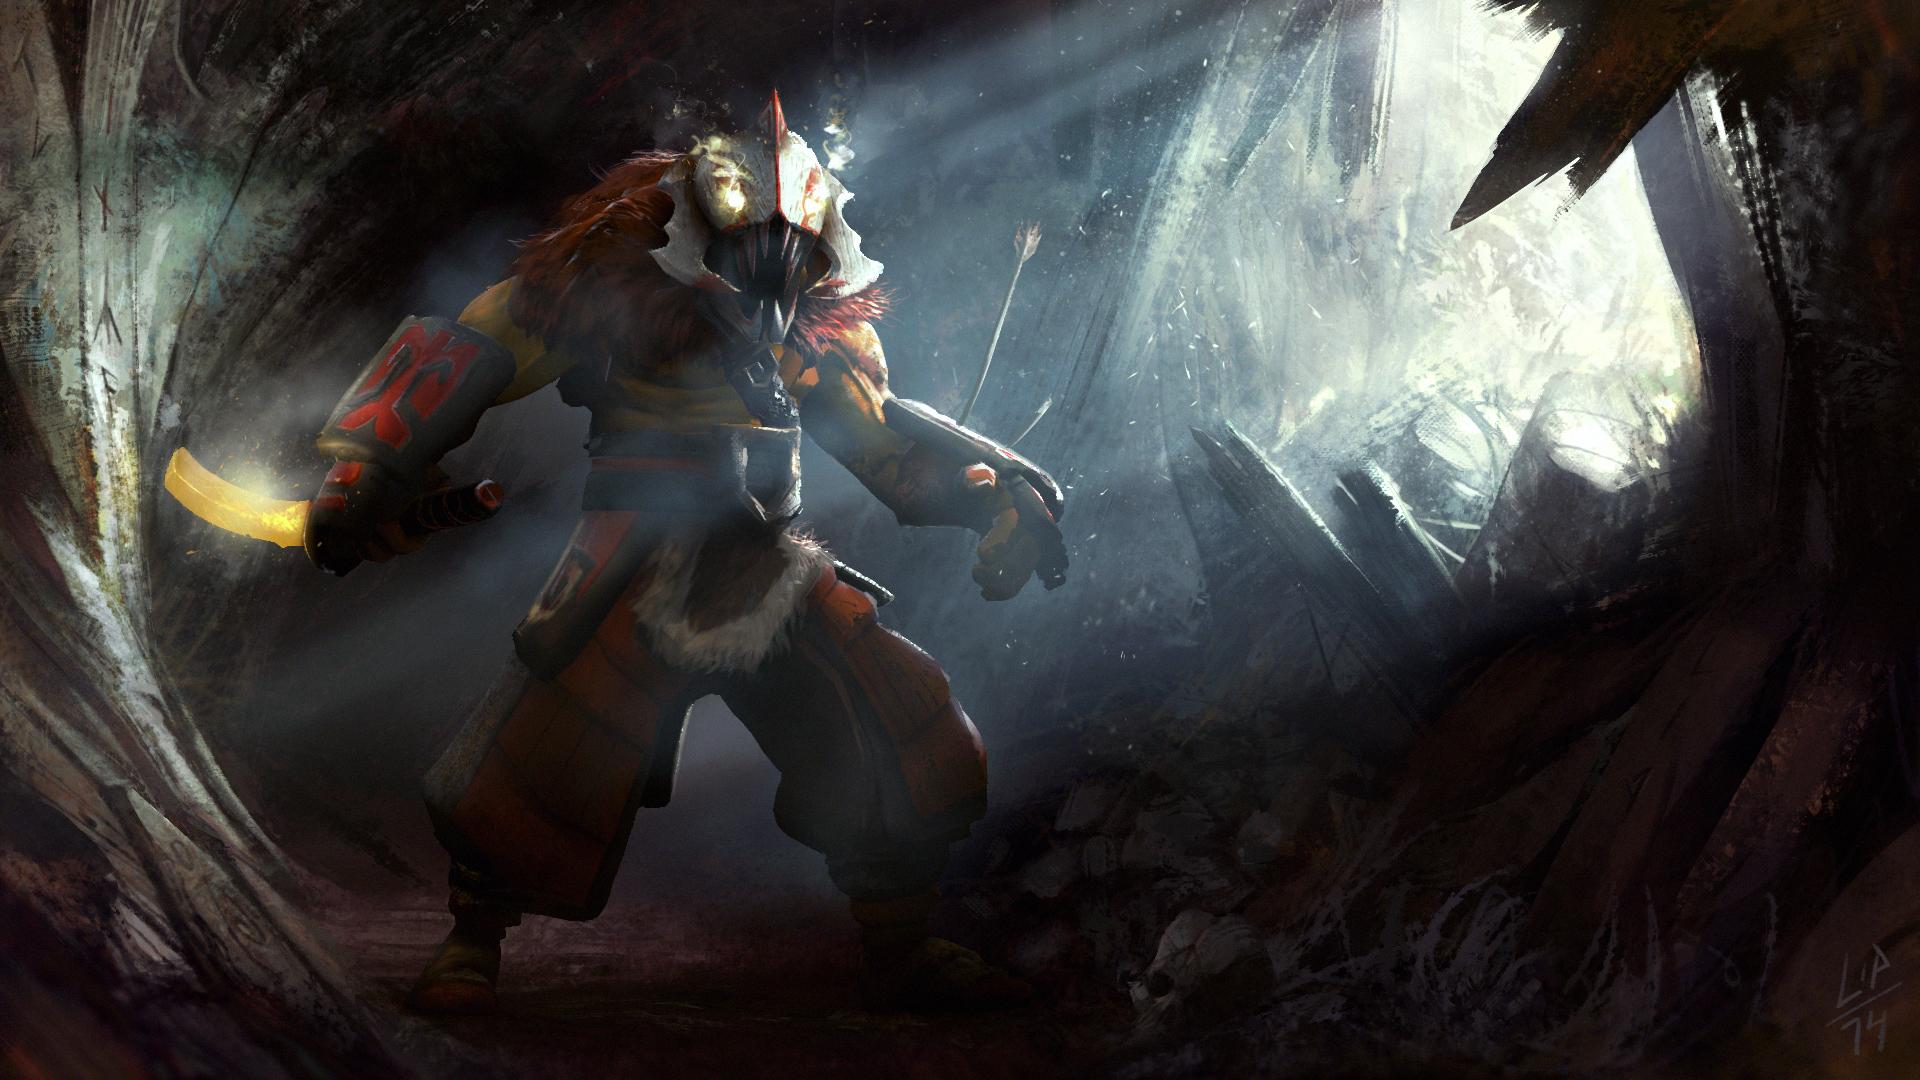 Juggernaut in cave wallpapers Dota 2